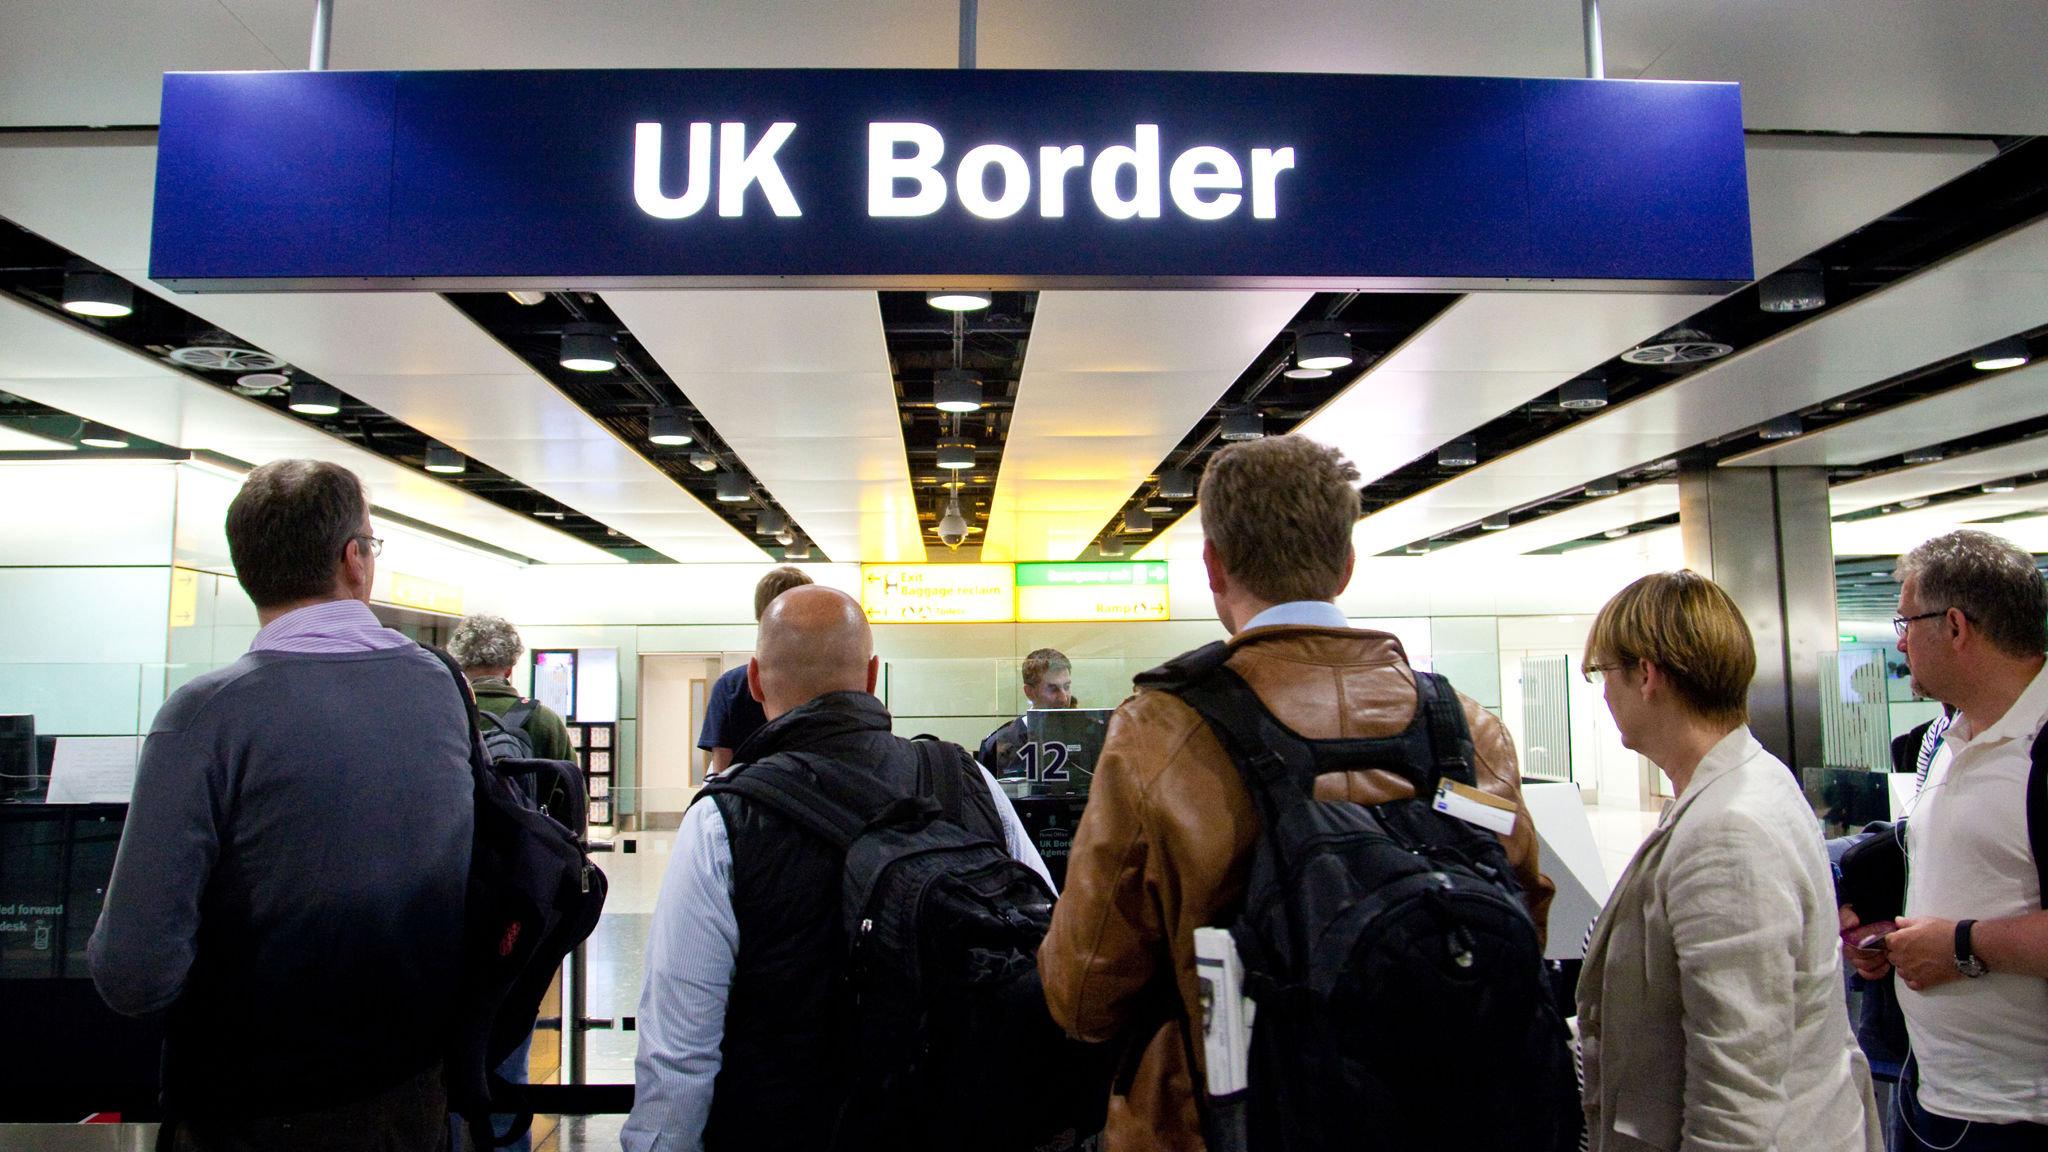 EU nationals seek passport stamps ahead of Brexit